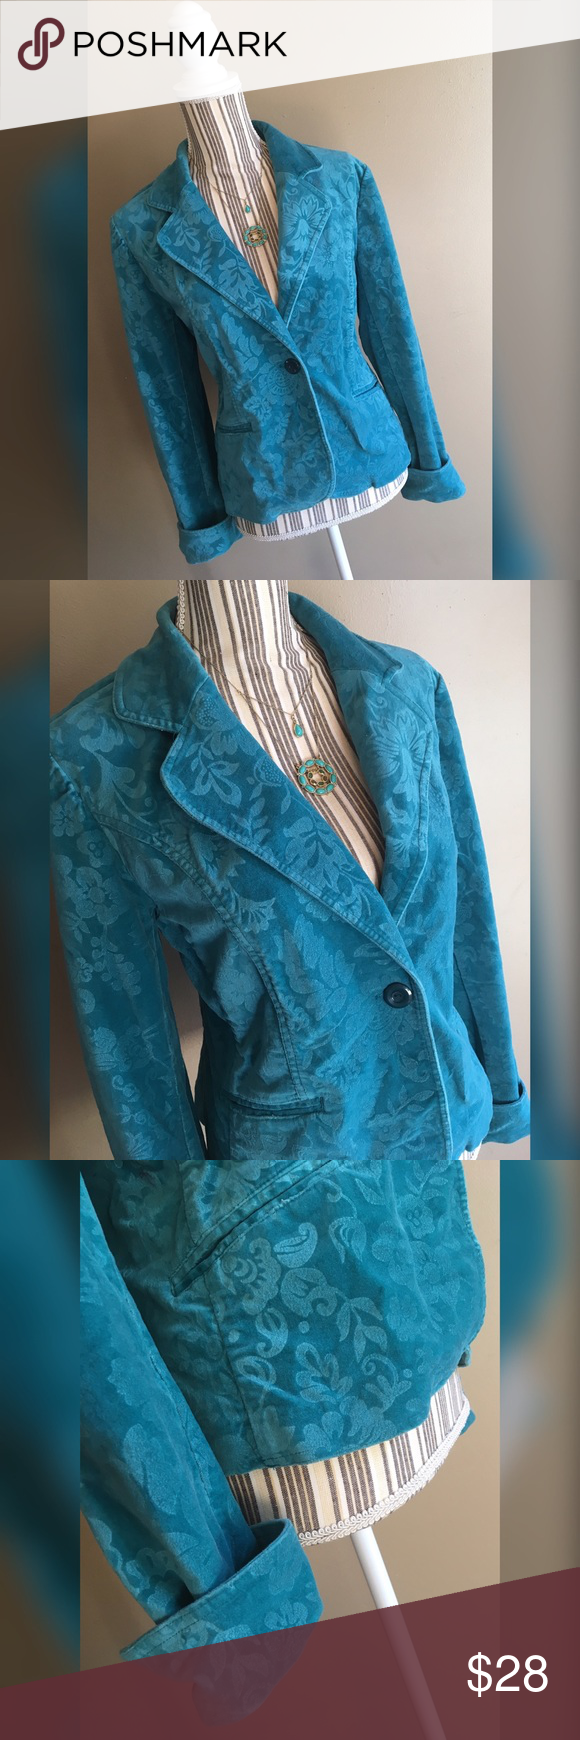 "Teal Floral Velvet Blazer Teal Floral Velvet Blazer by Relativity. Size Large. Bust 41"" lying flat, stretches to 43"". Shoulder to hem length 23.5"". Relativity Jackets & Coats Blazers"